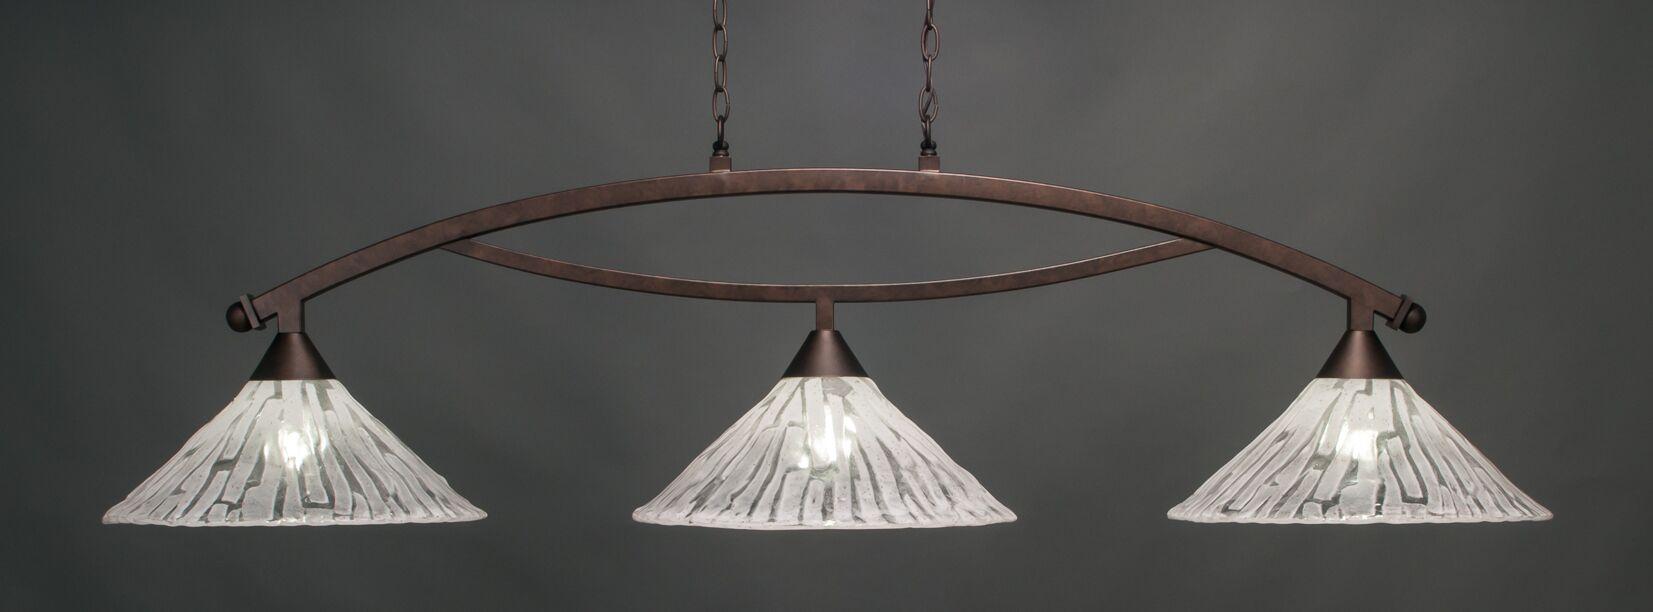 Eisenhauer Bow 3-Light Billiard Pendant